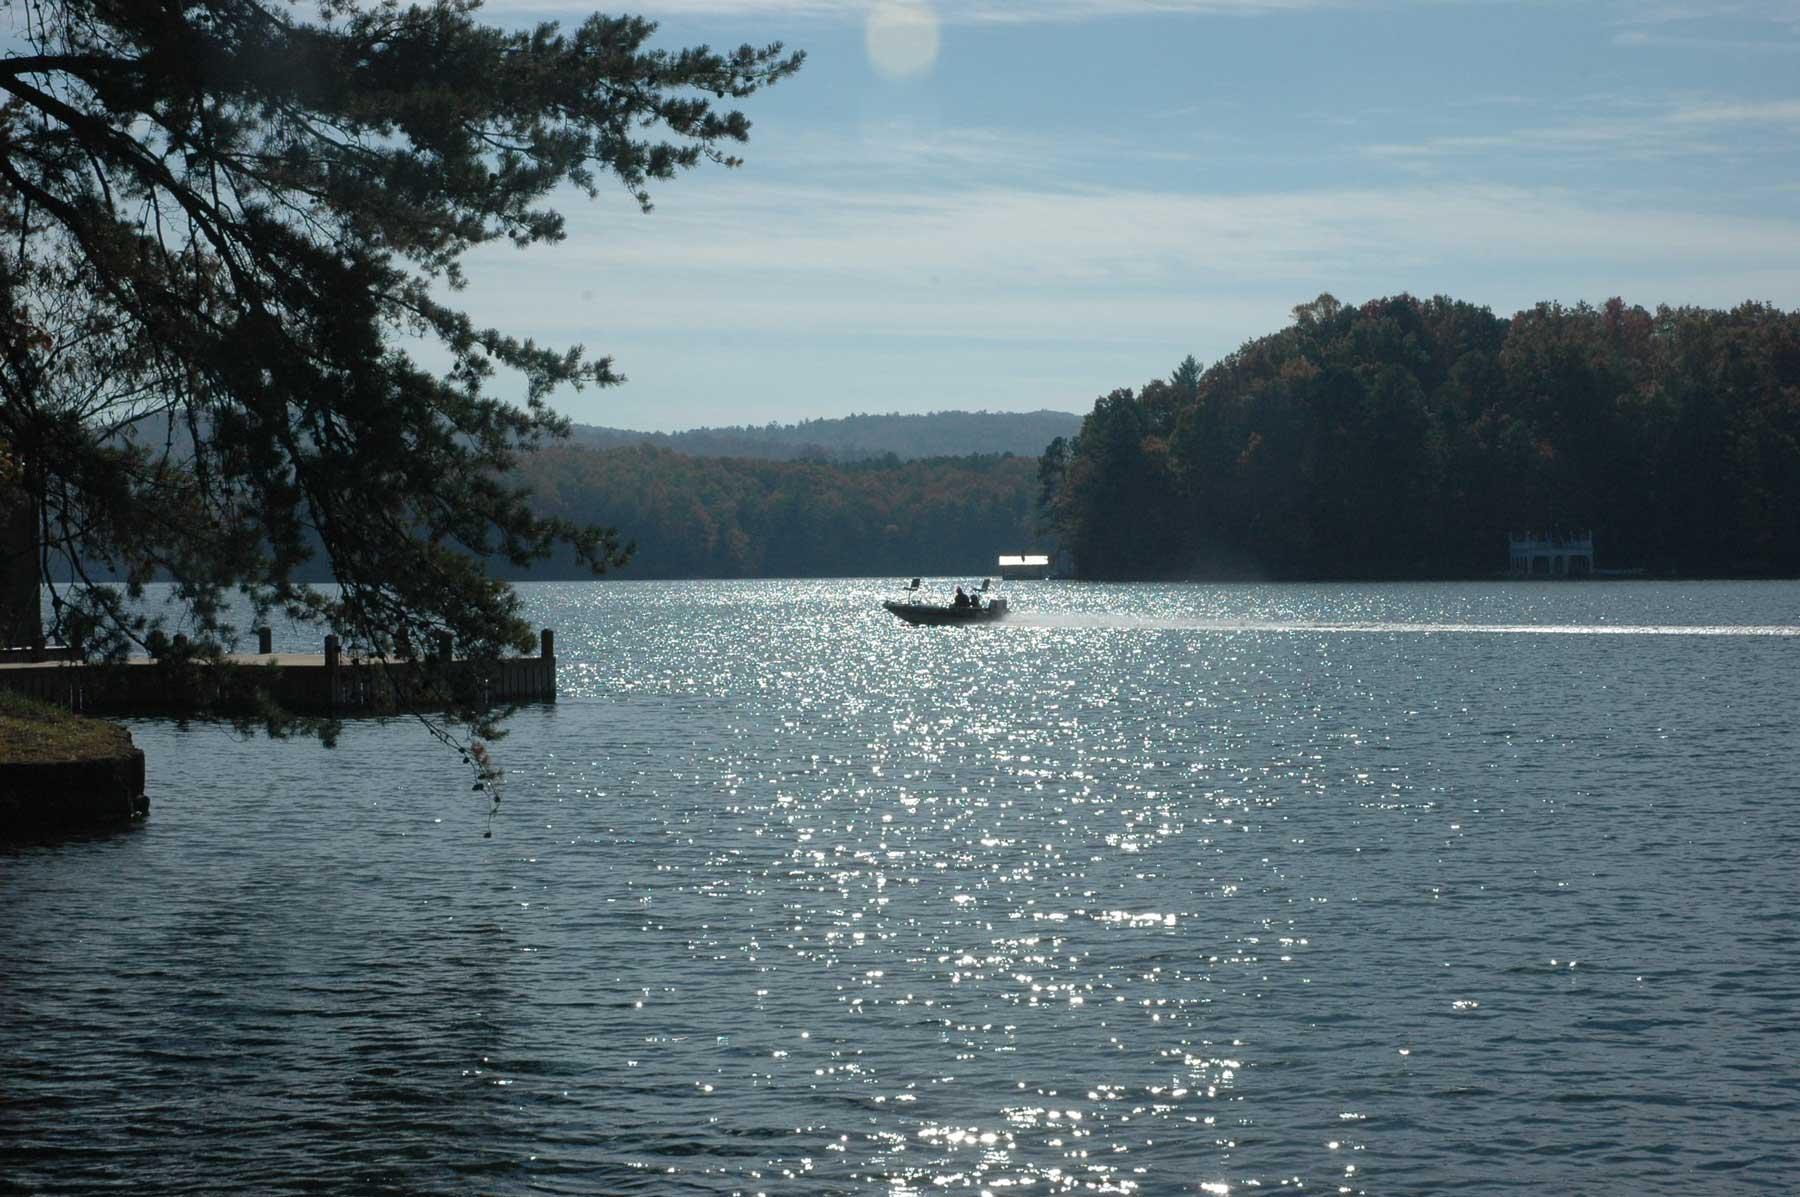 Lake_Burton_with_boat.jpg